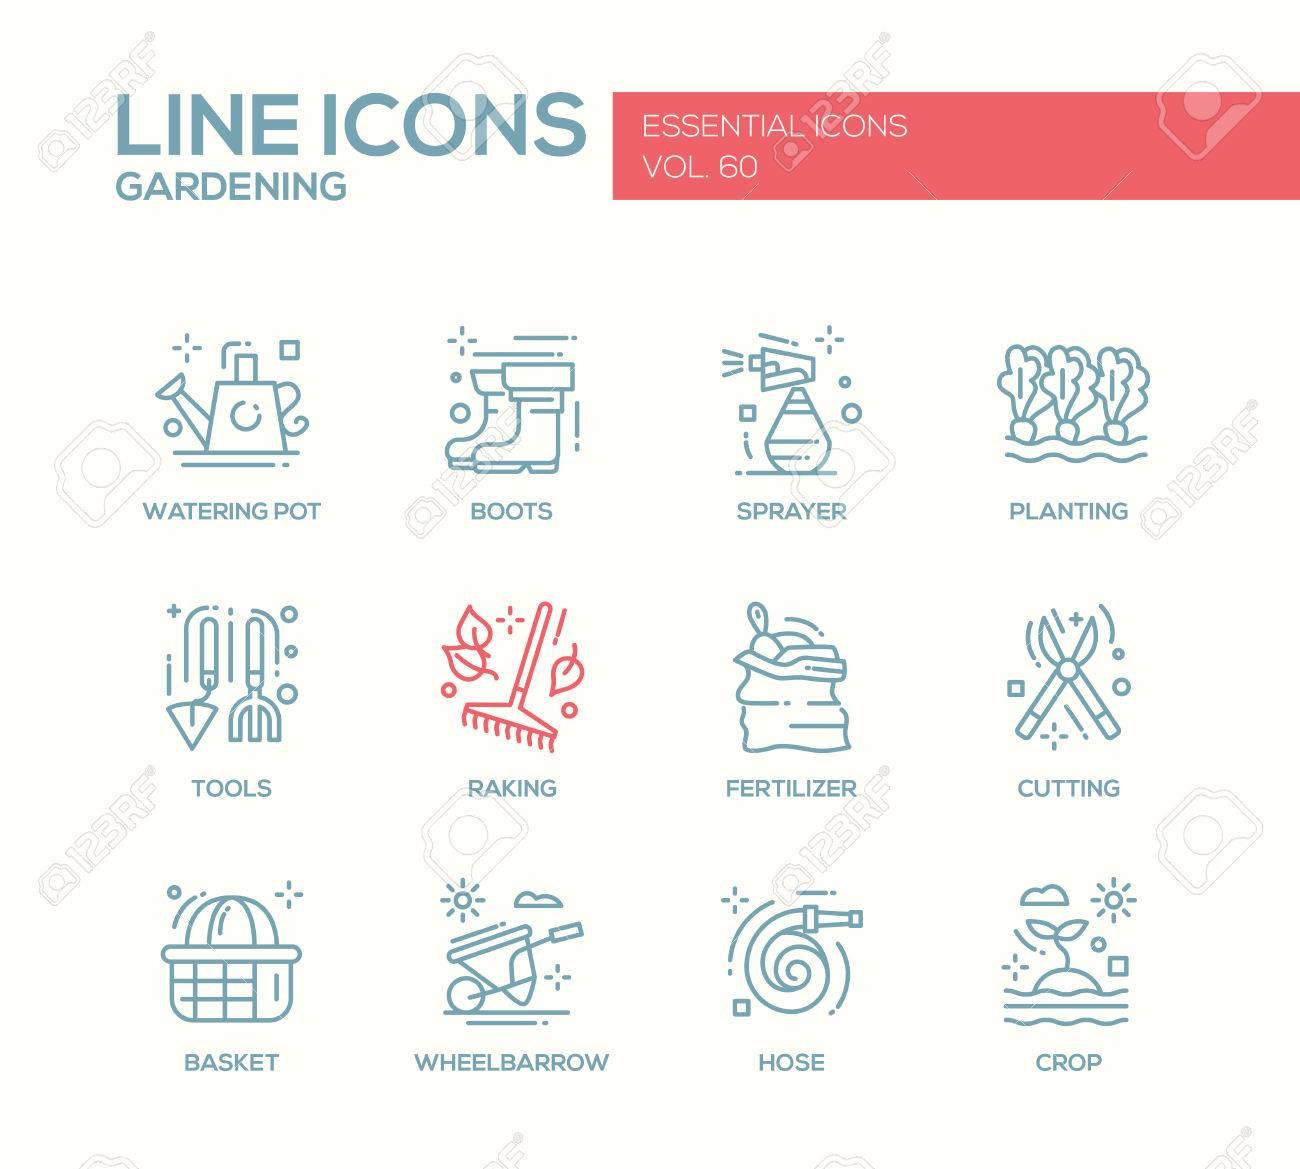 Jardinage - Vecteur Moderne Ligne Simple Icônes Du Design Et Des ...